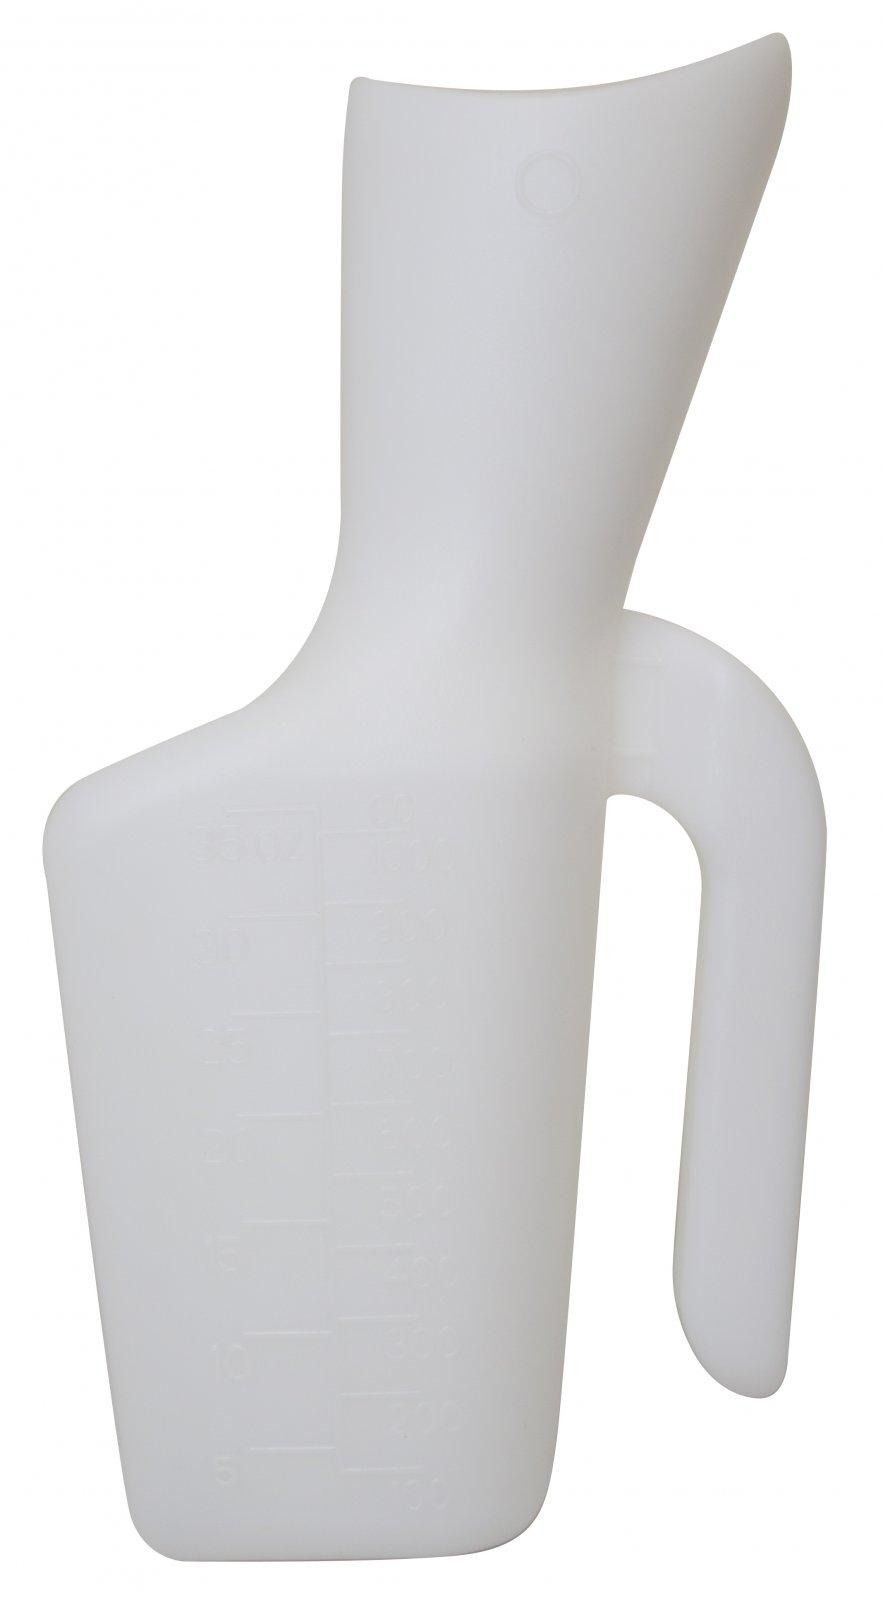 Urinal, Female